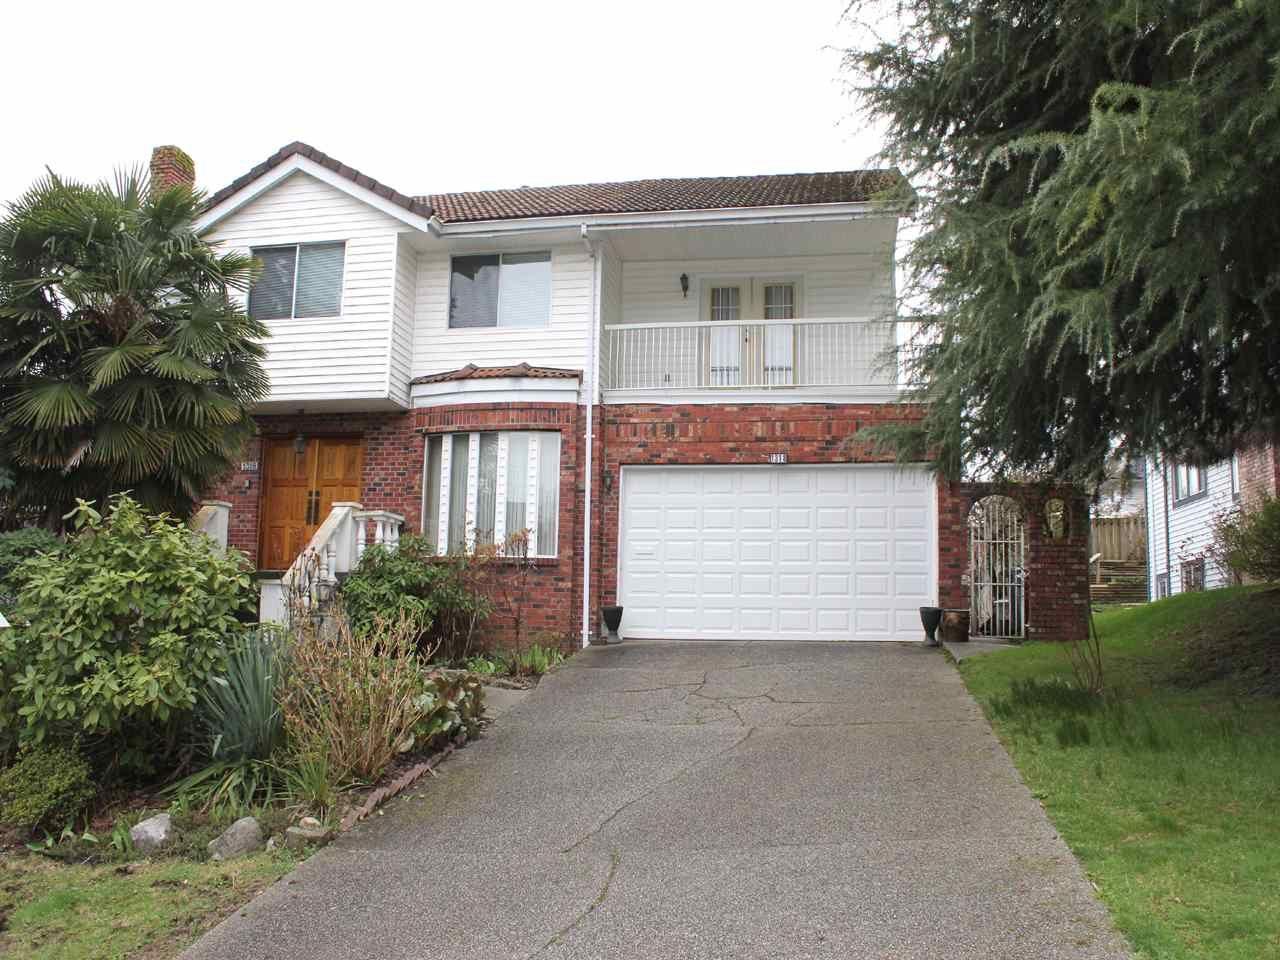 Main Photo: 1318 HONEYSUCKLE LANE in : Summitt View House for sale : MLS®# R2044931